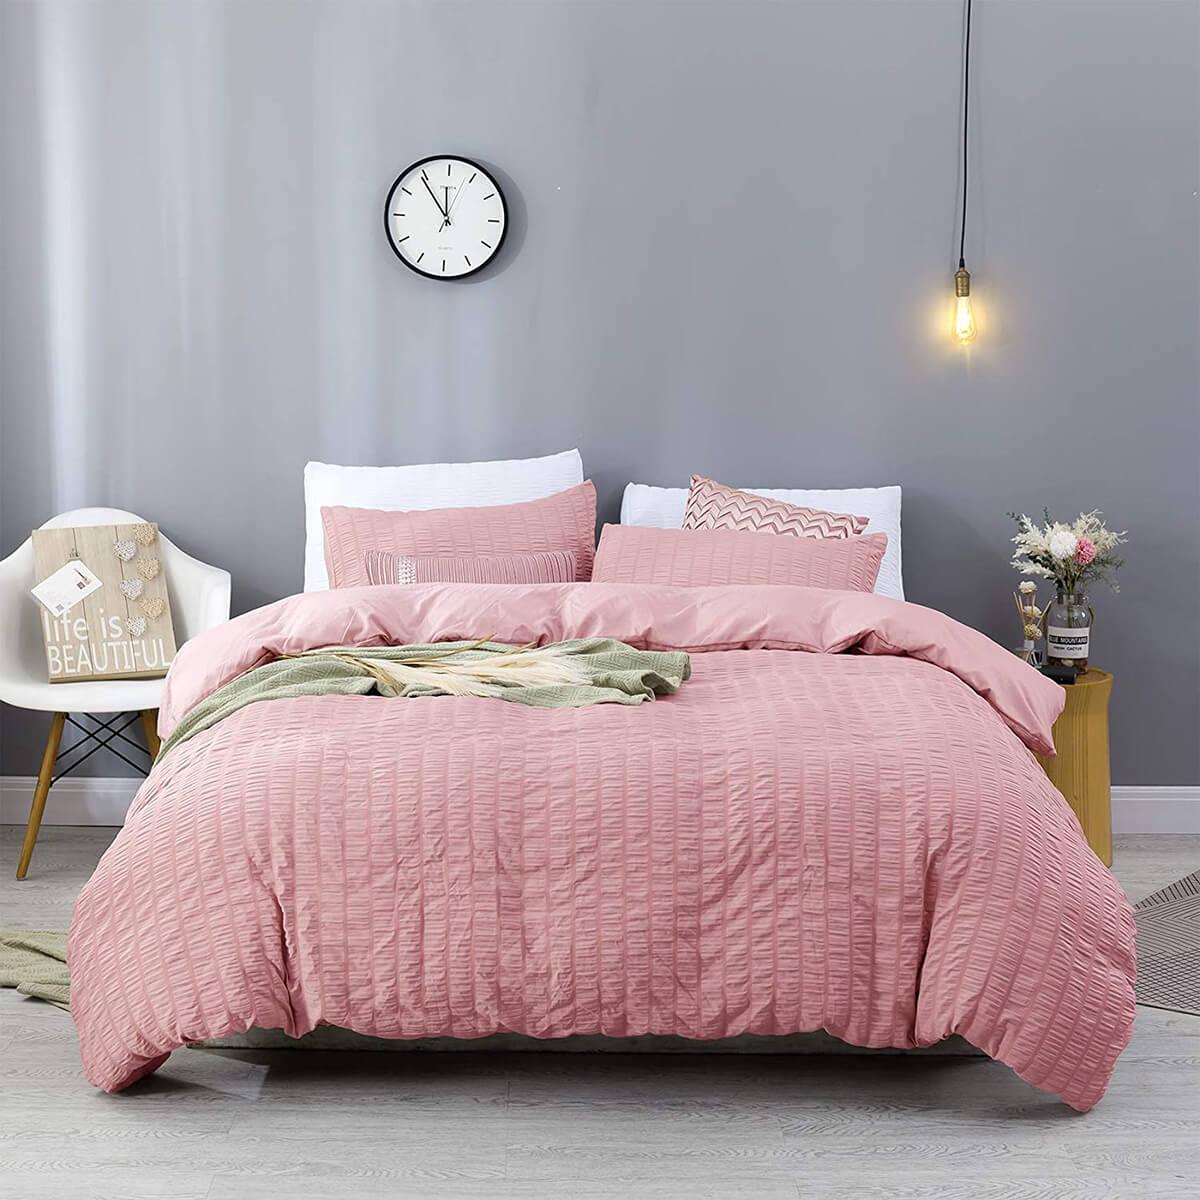 Luxurious Solid Striped Texture Duvet Bedding